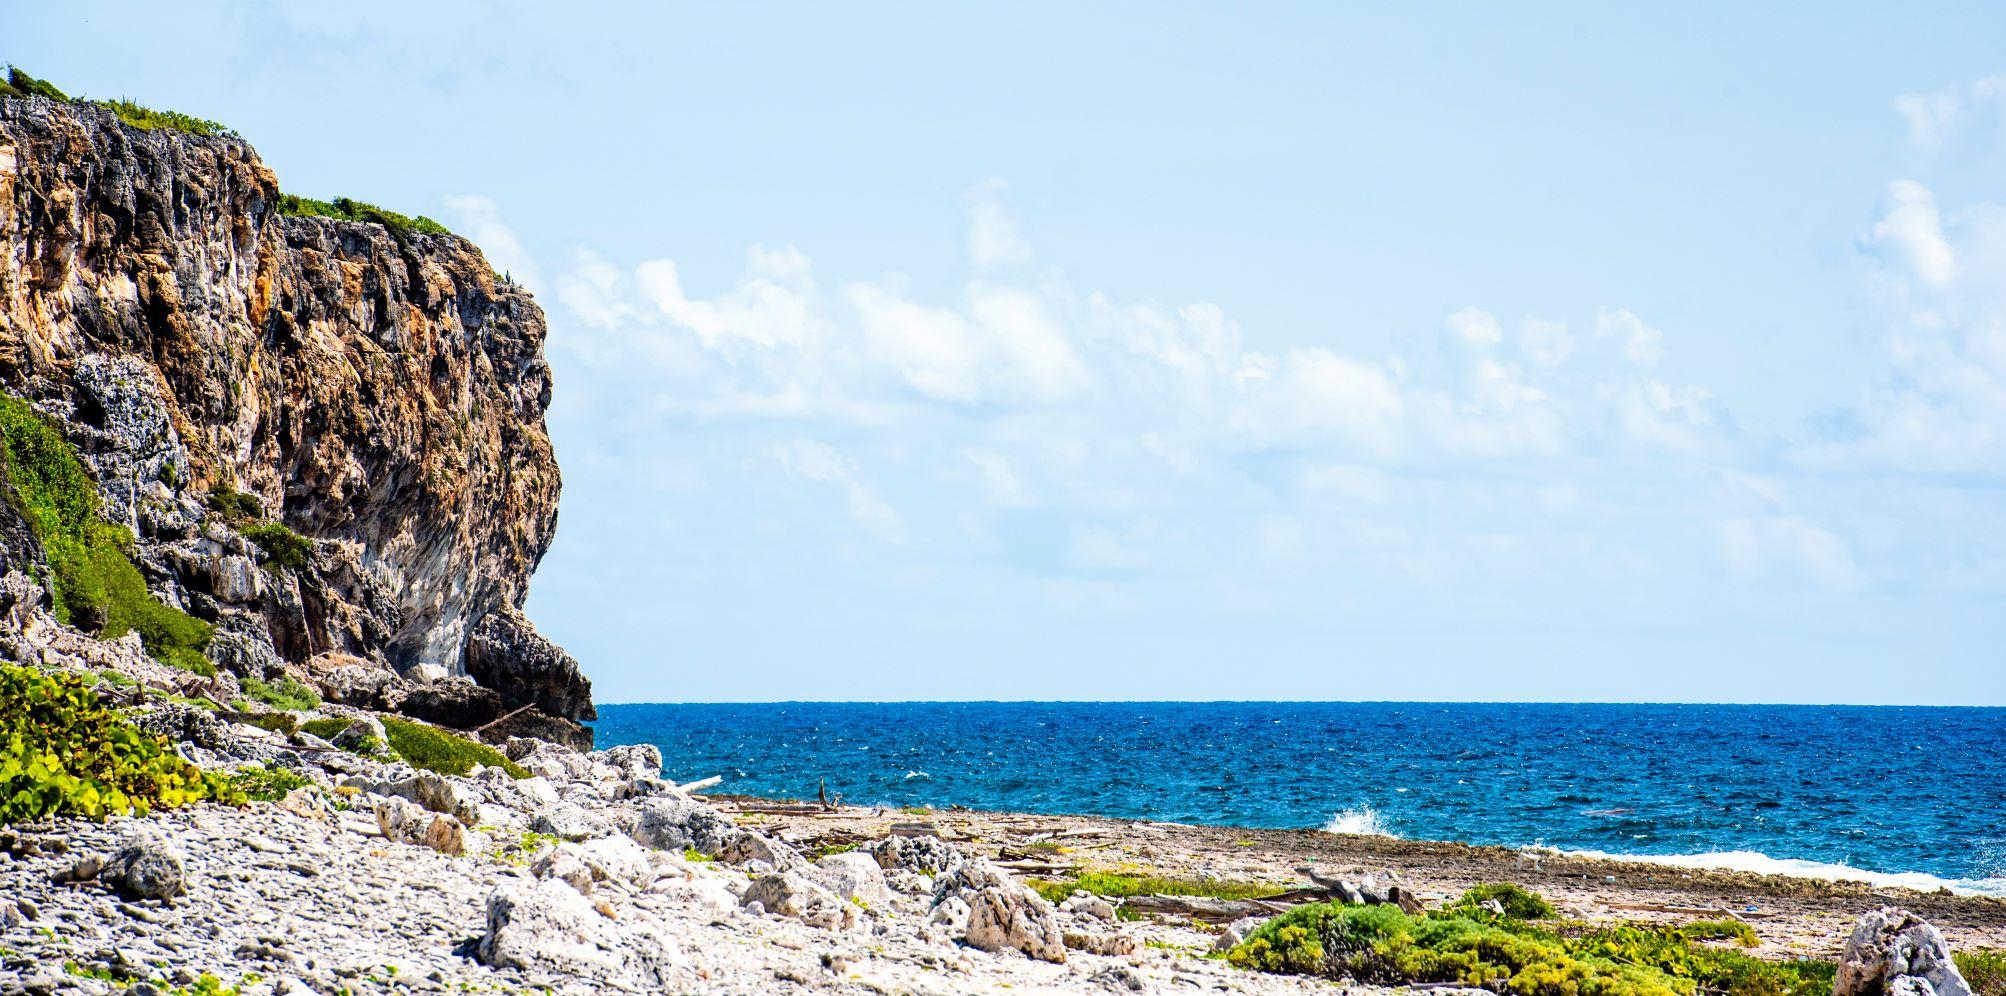 Cayman Brac Real Estate - Property Cayman